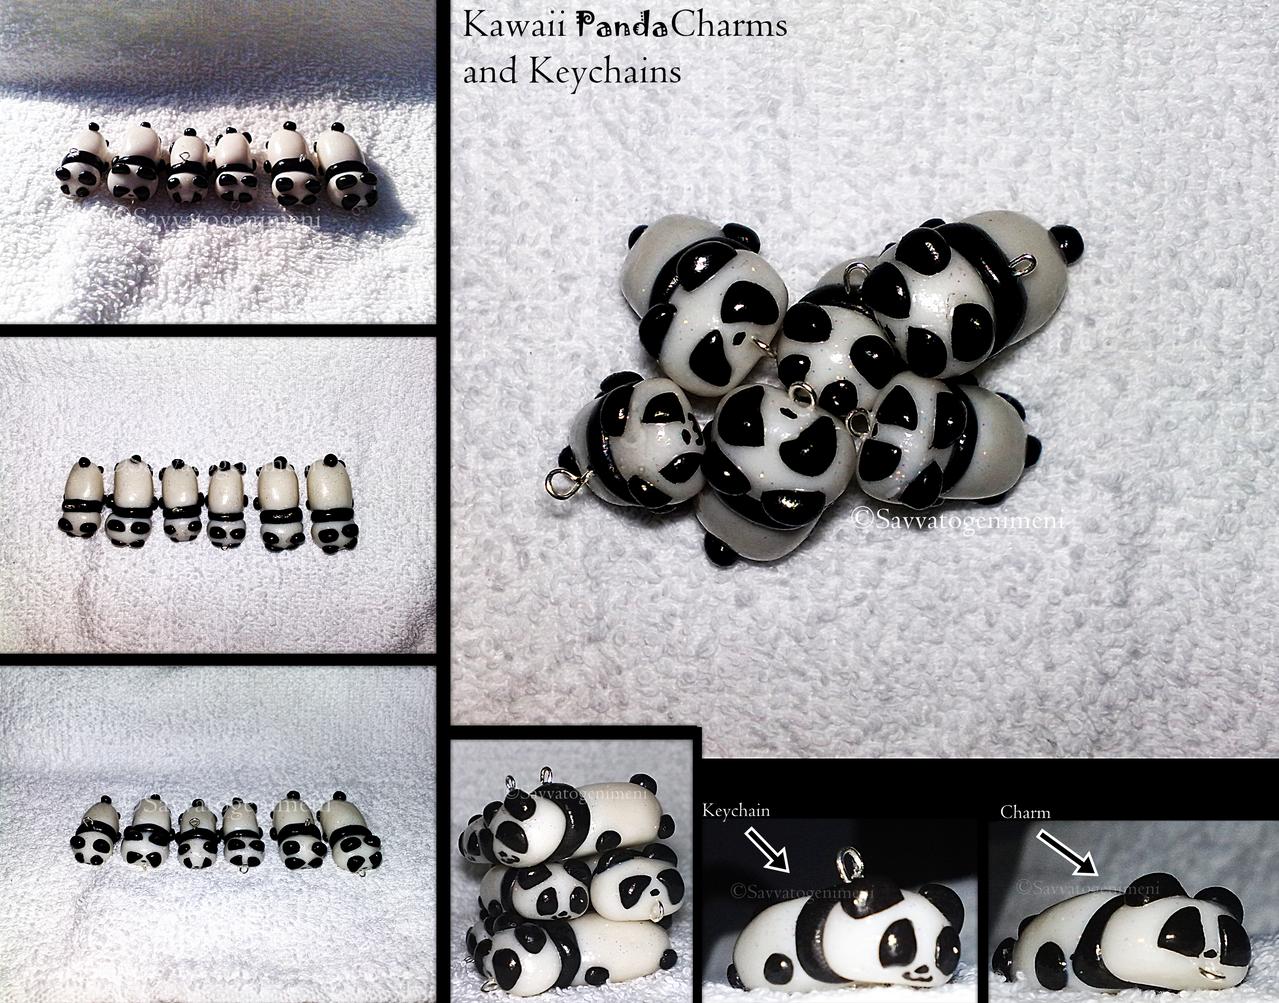 Kawaii Panda Charms and Keychains by Savvatogenimeni